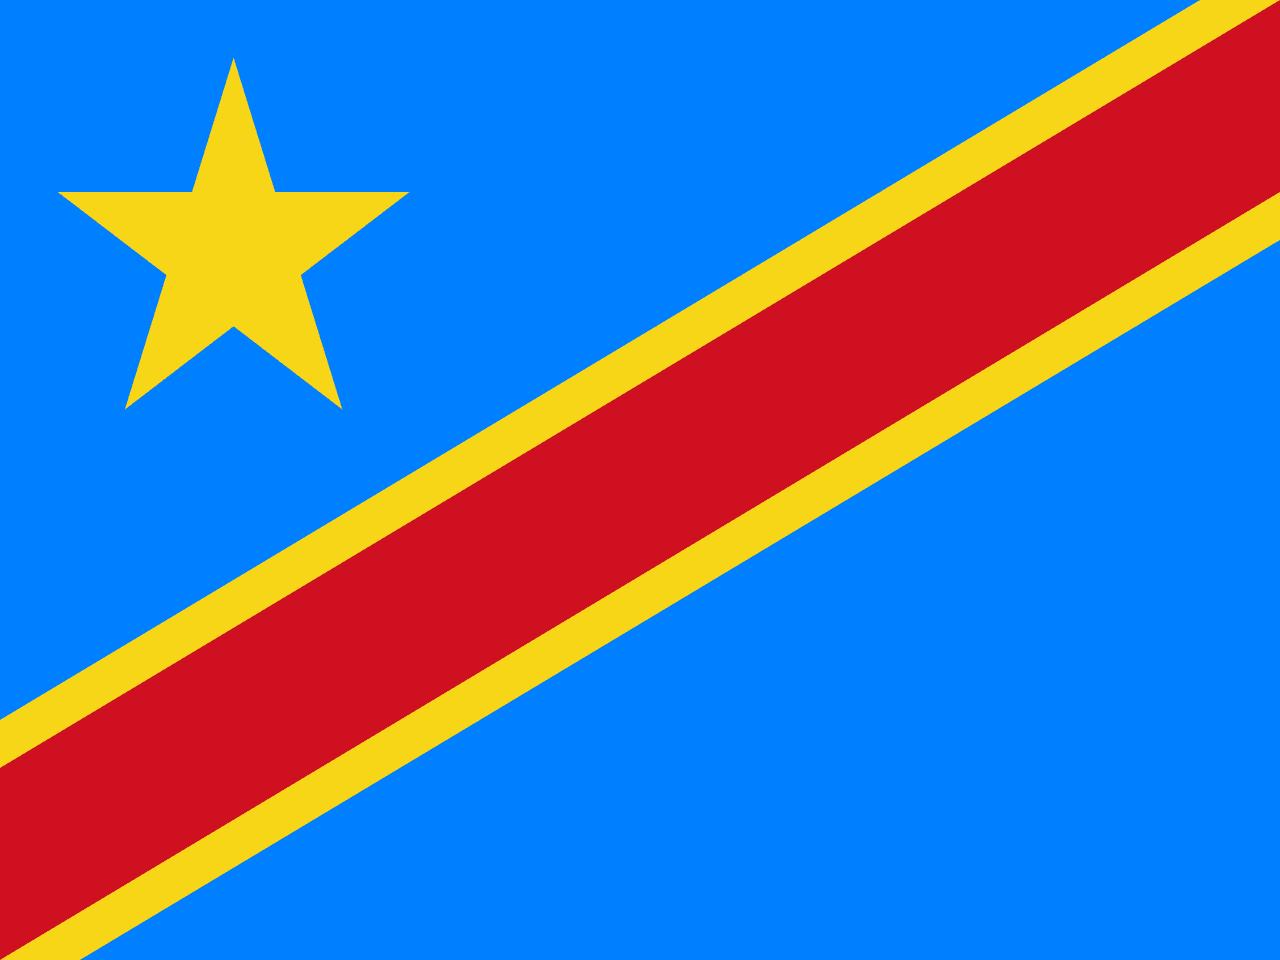 flag of the congo democratic republic the symbol of. Black Bedroom Furniture Sets. Home Design Ideas